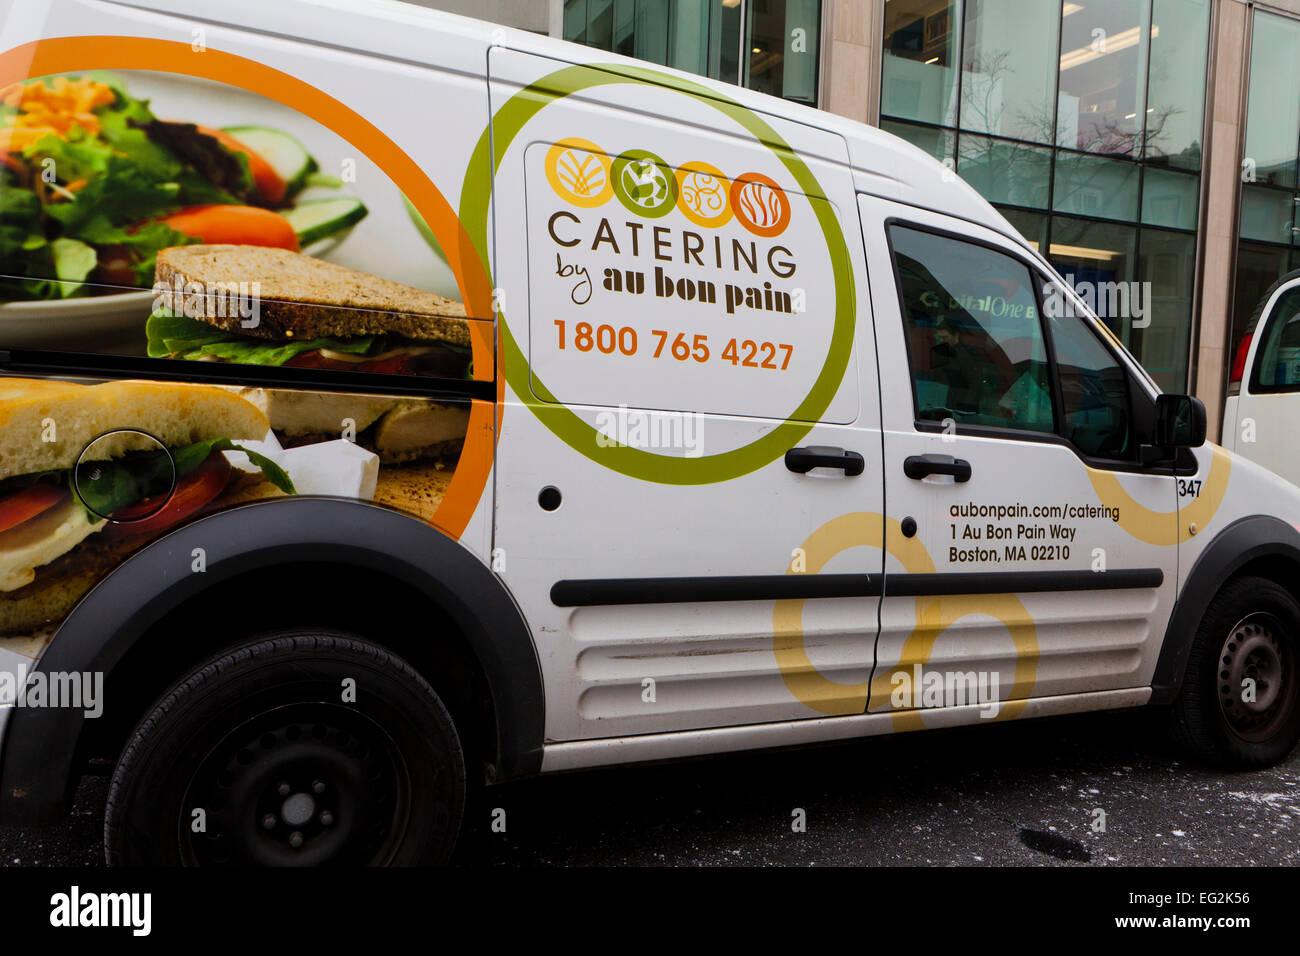 Au Bon Pain Catering delivery van - Washington, DC USA Stock Photo